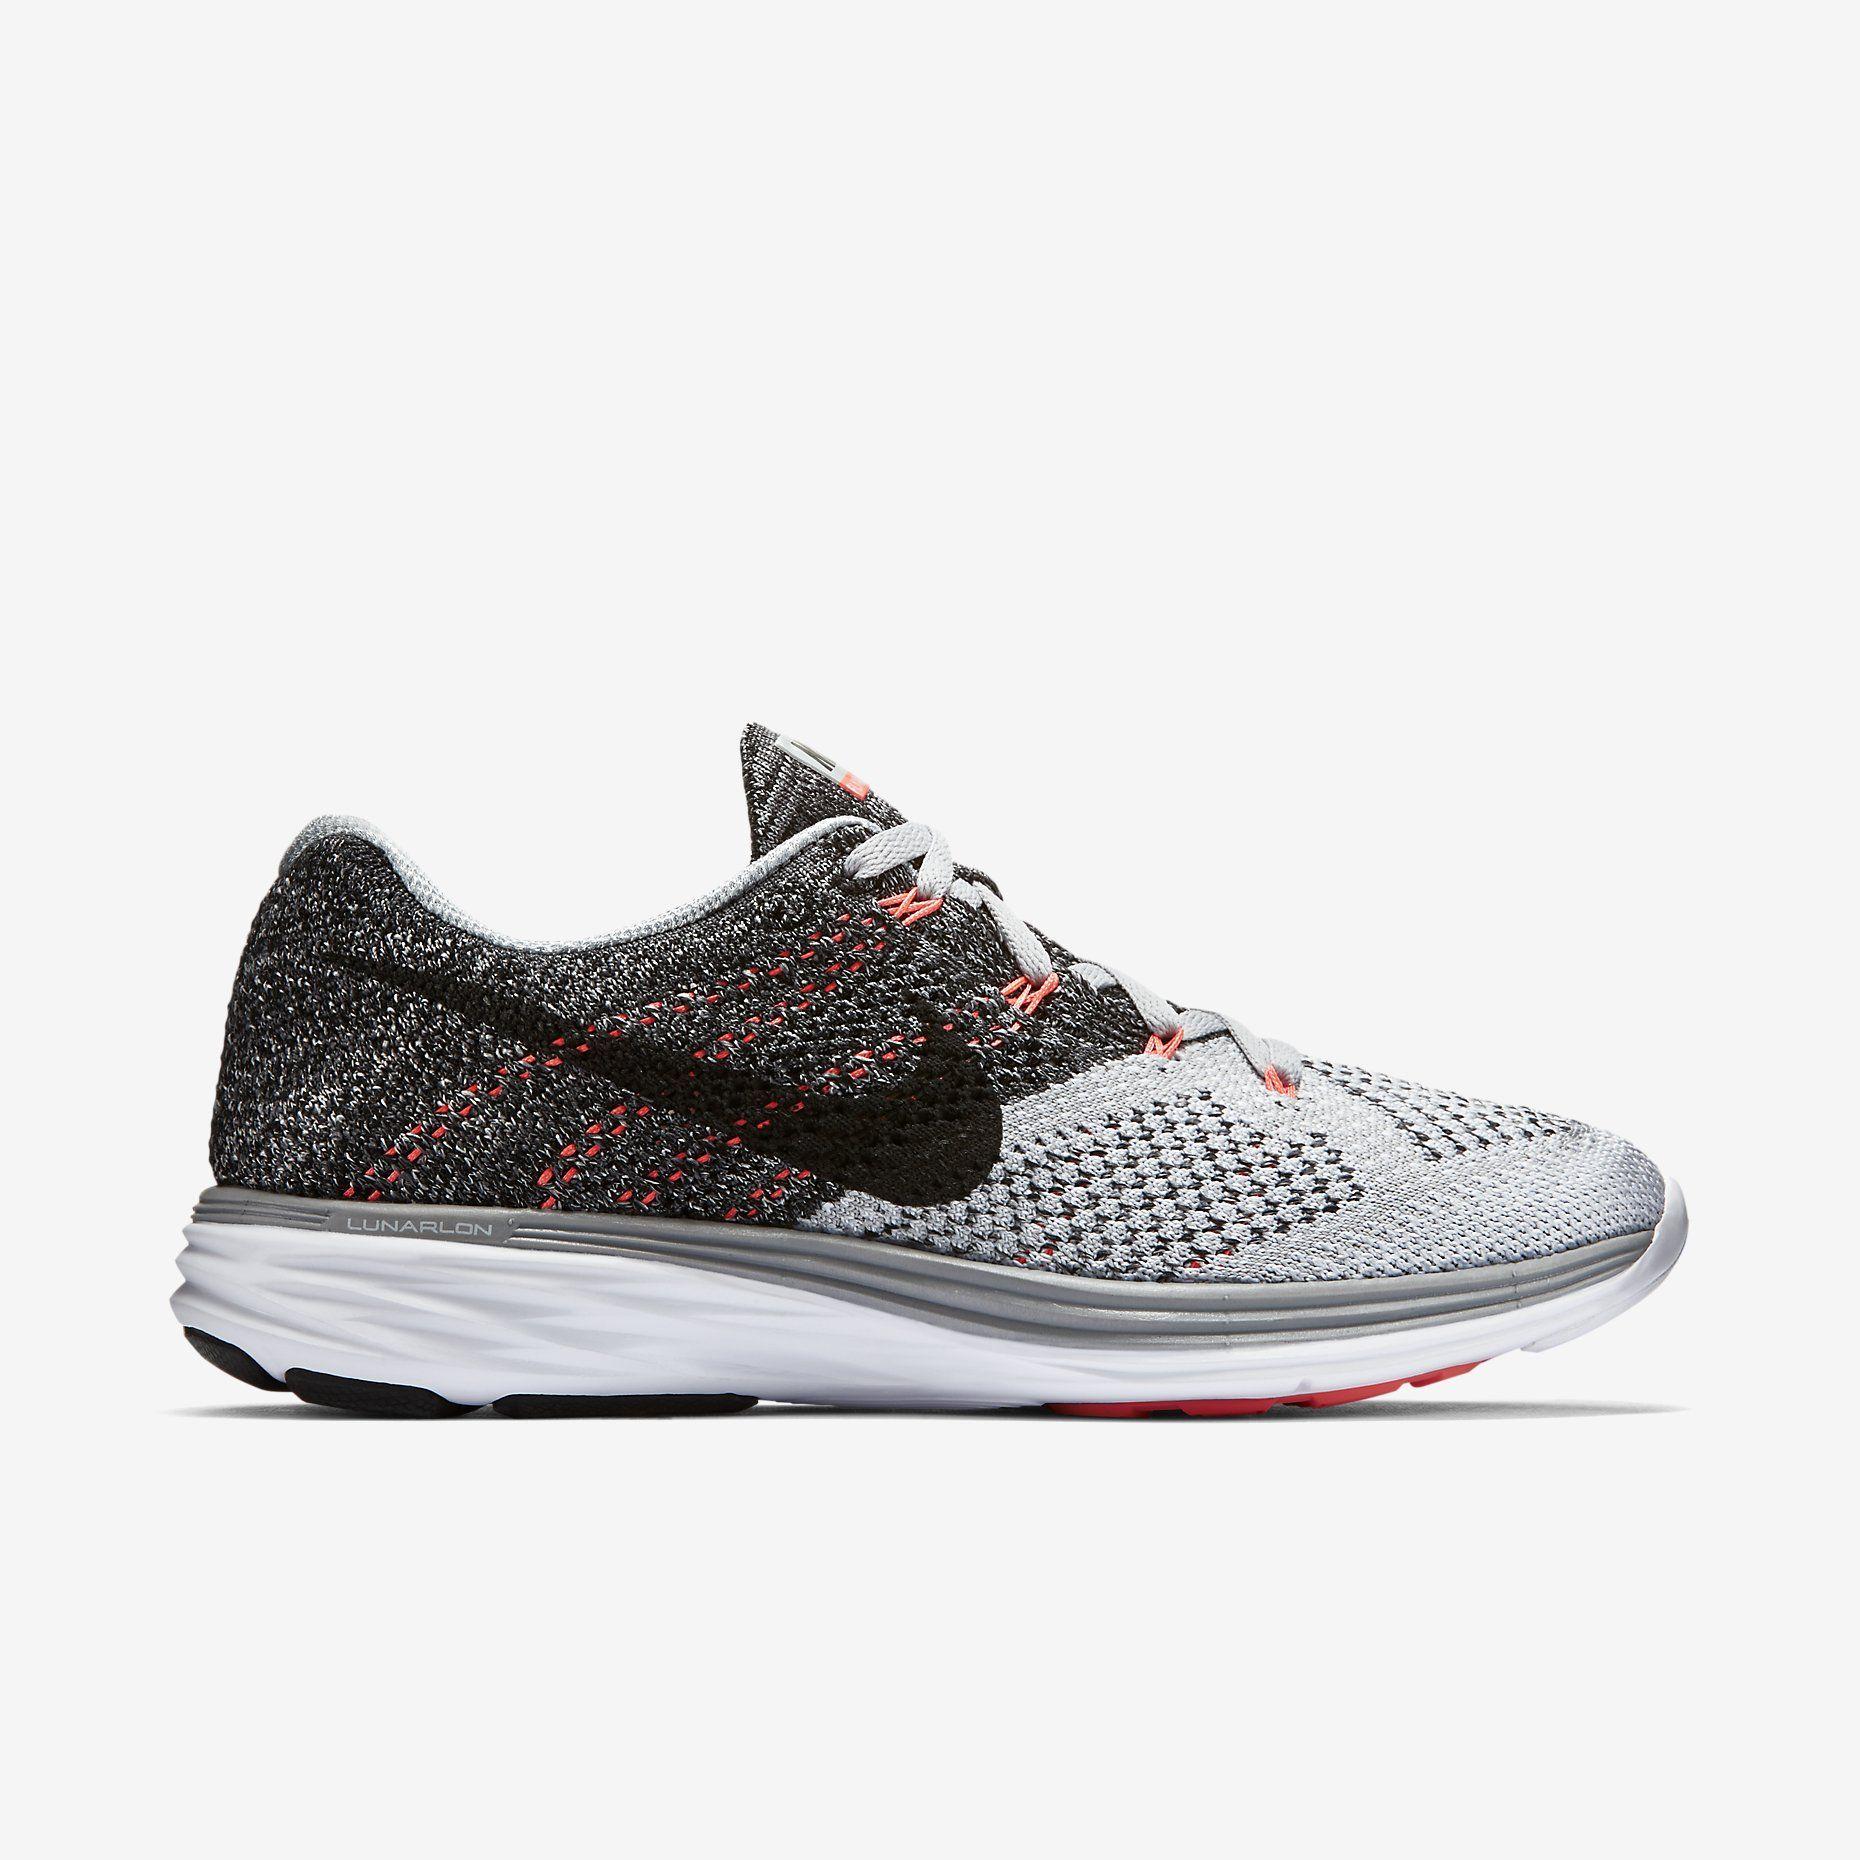 cheap for discount 71042 fe099 Damskie buty do biegania Nike Flyknit Lunar 3